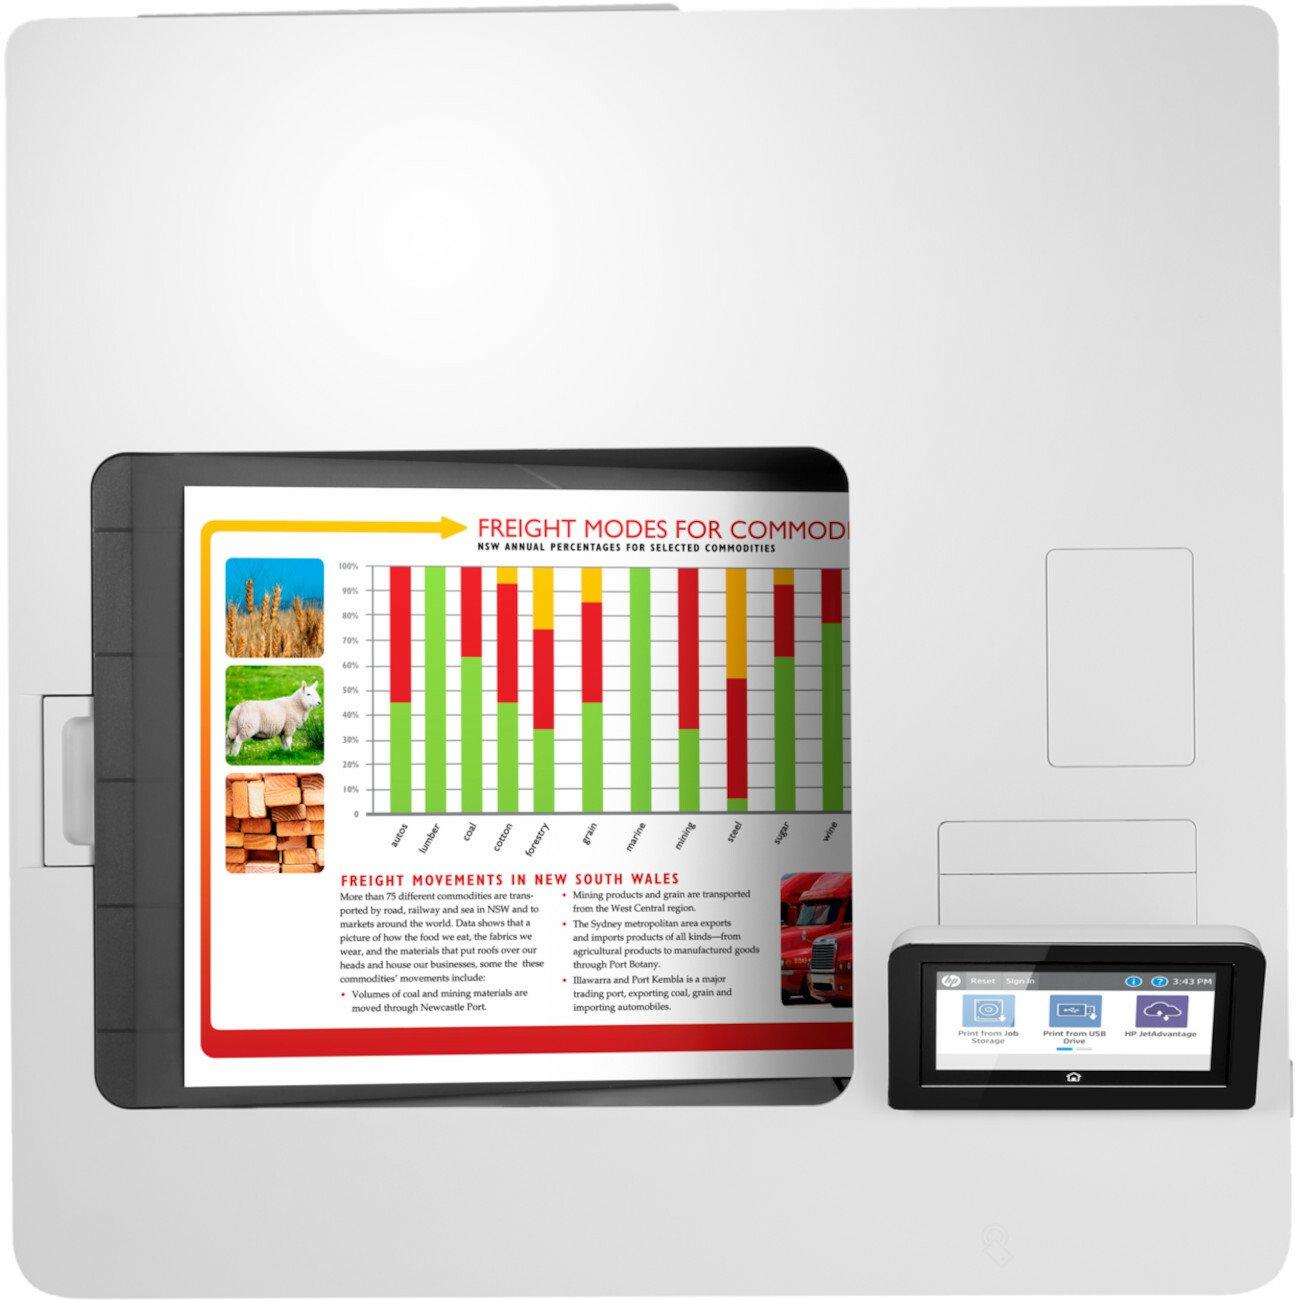 HP LaserJet Enterprise M555 M555x Desktop Laser Printer - Colour